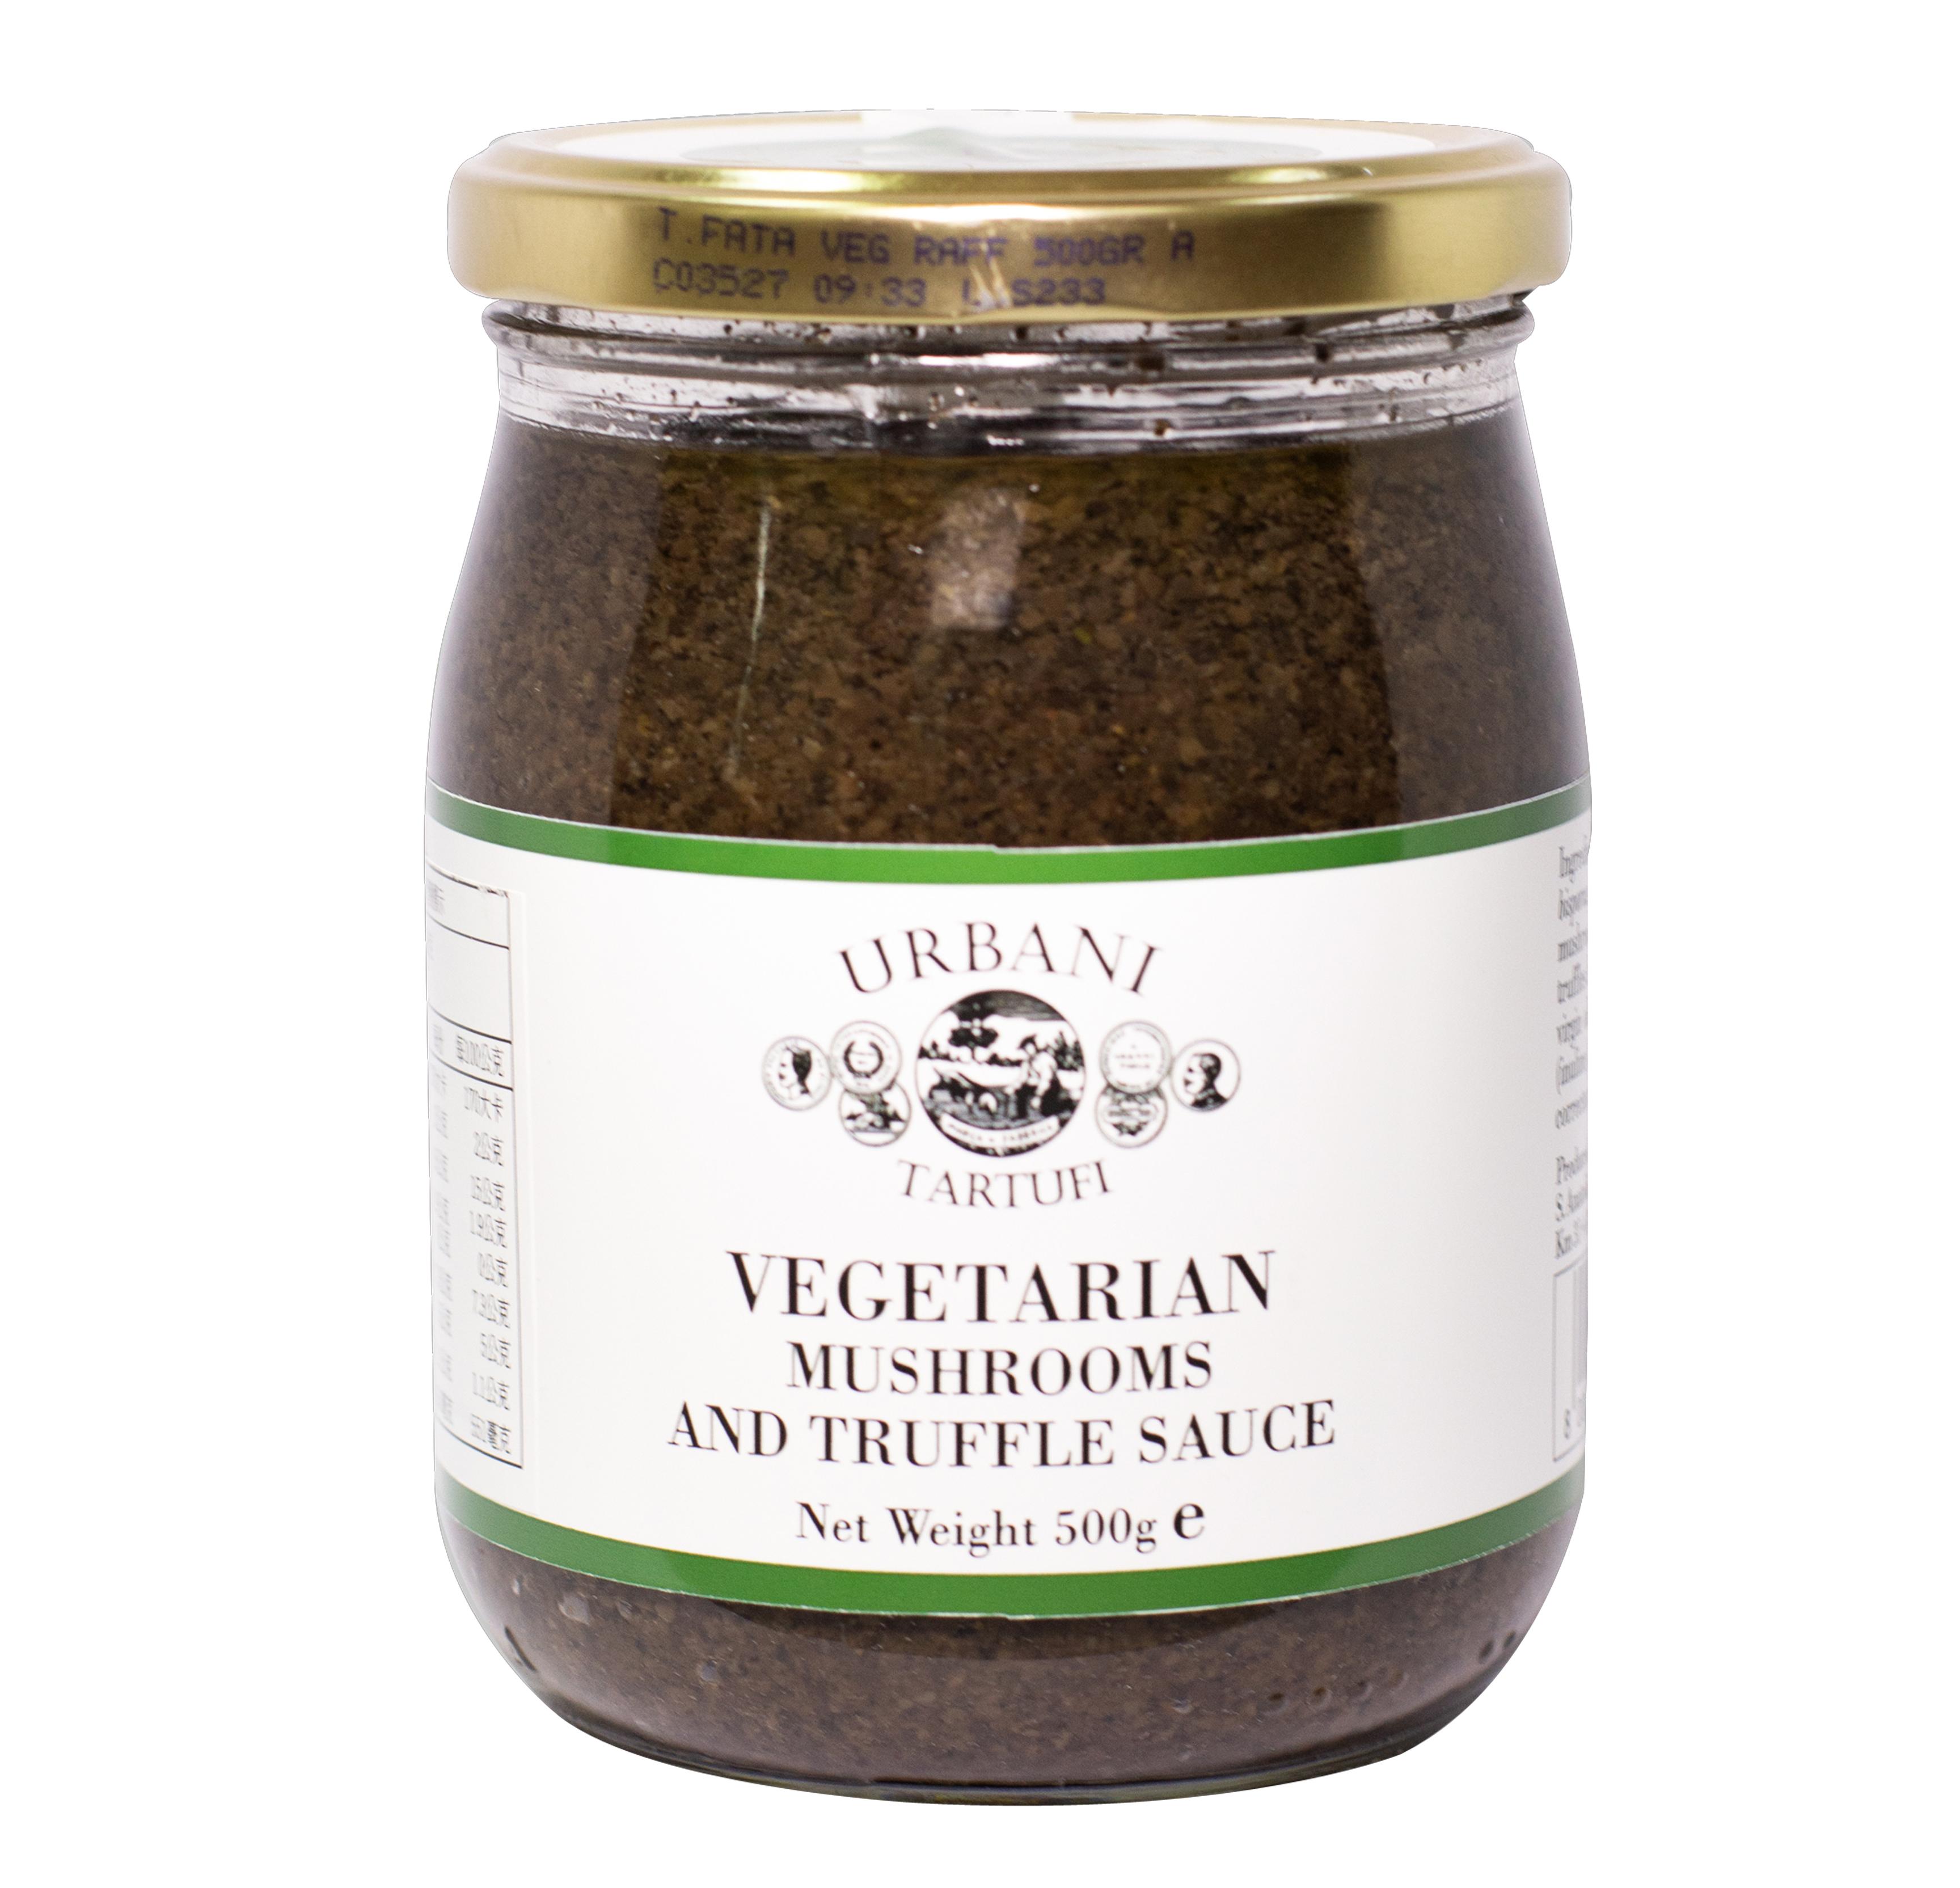 Image Urbani Vegetarian mushrooms and truffle sauce 松露酱 500grams